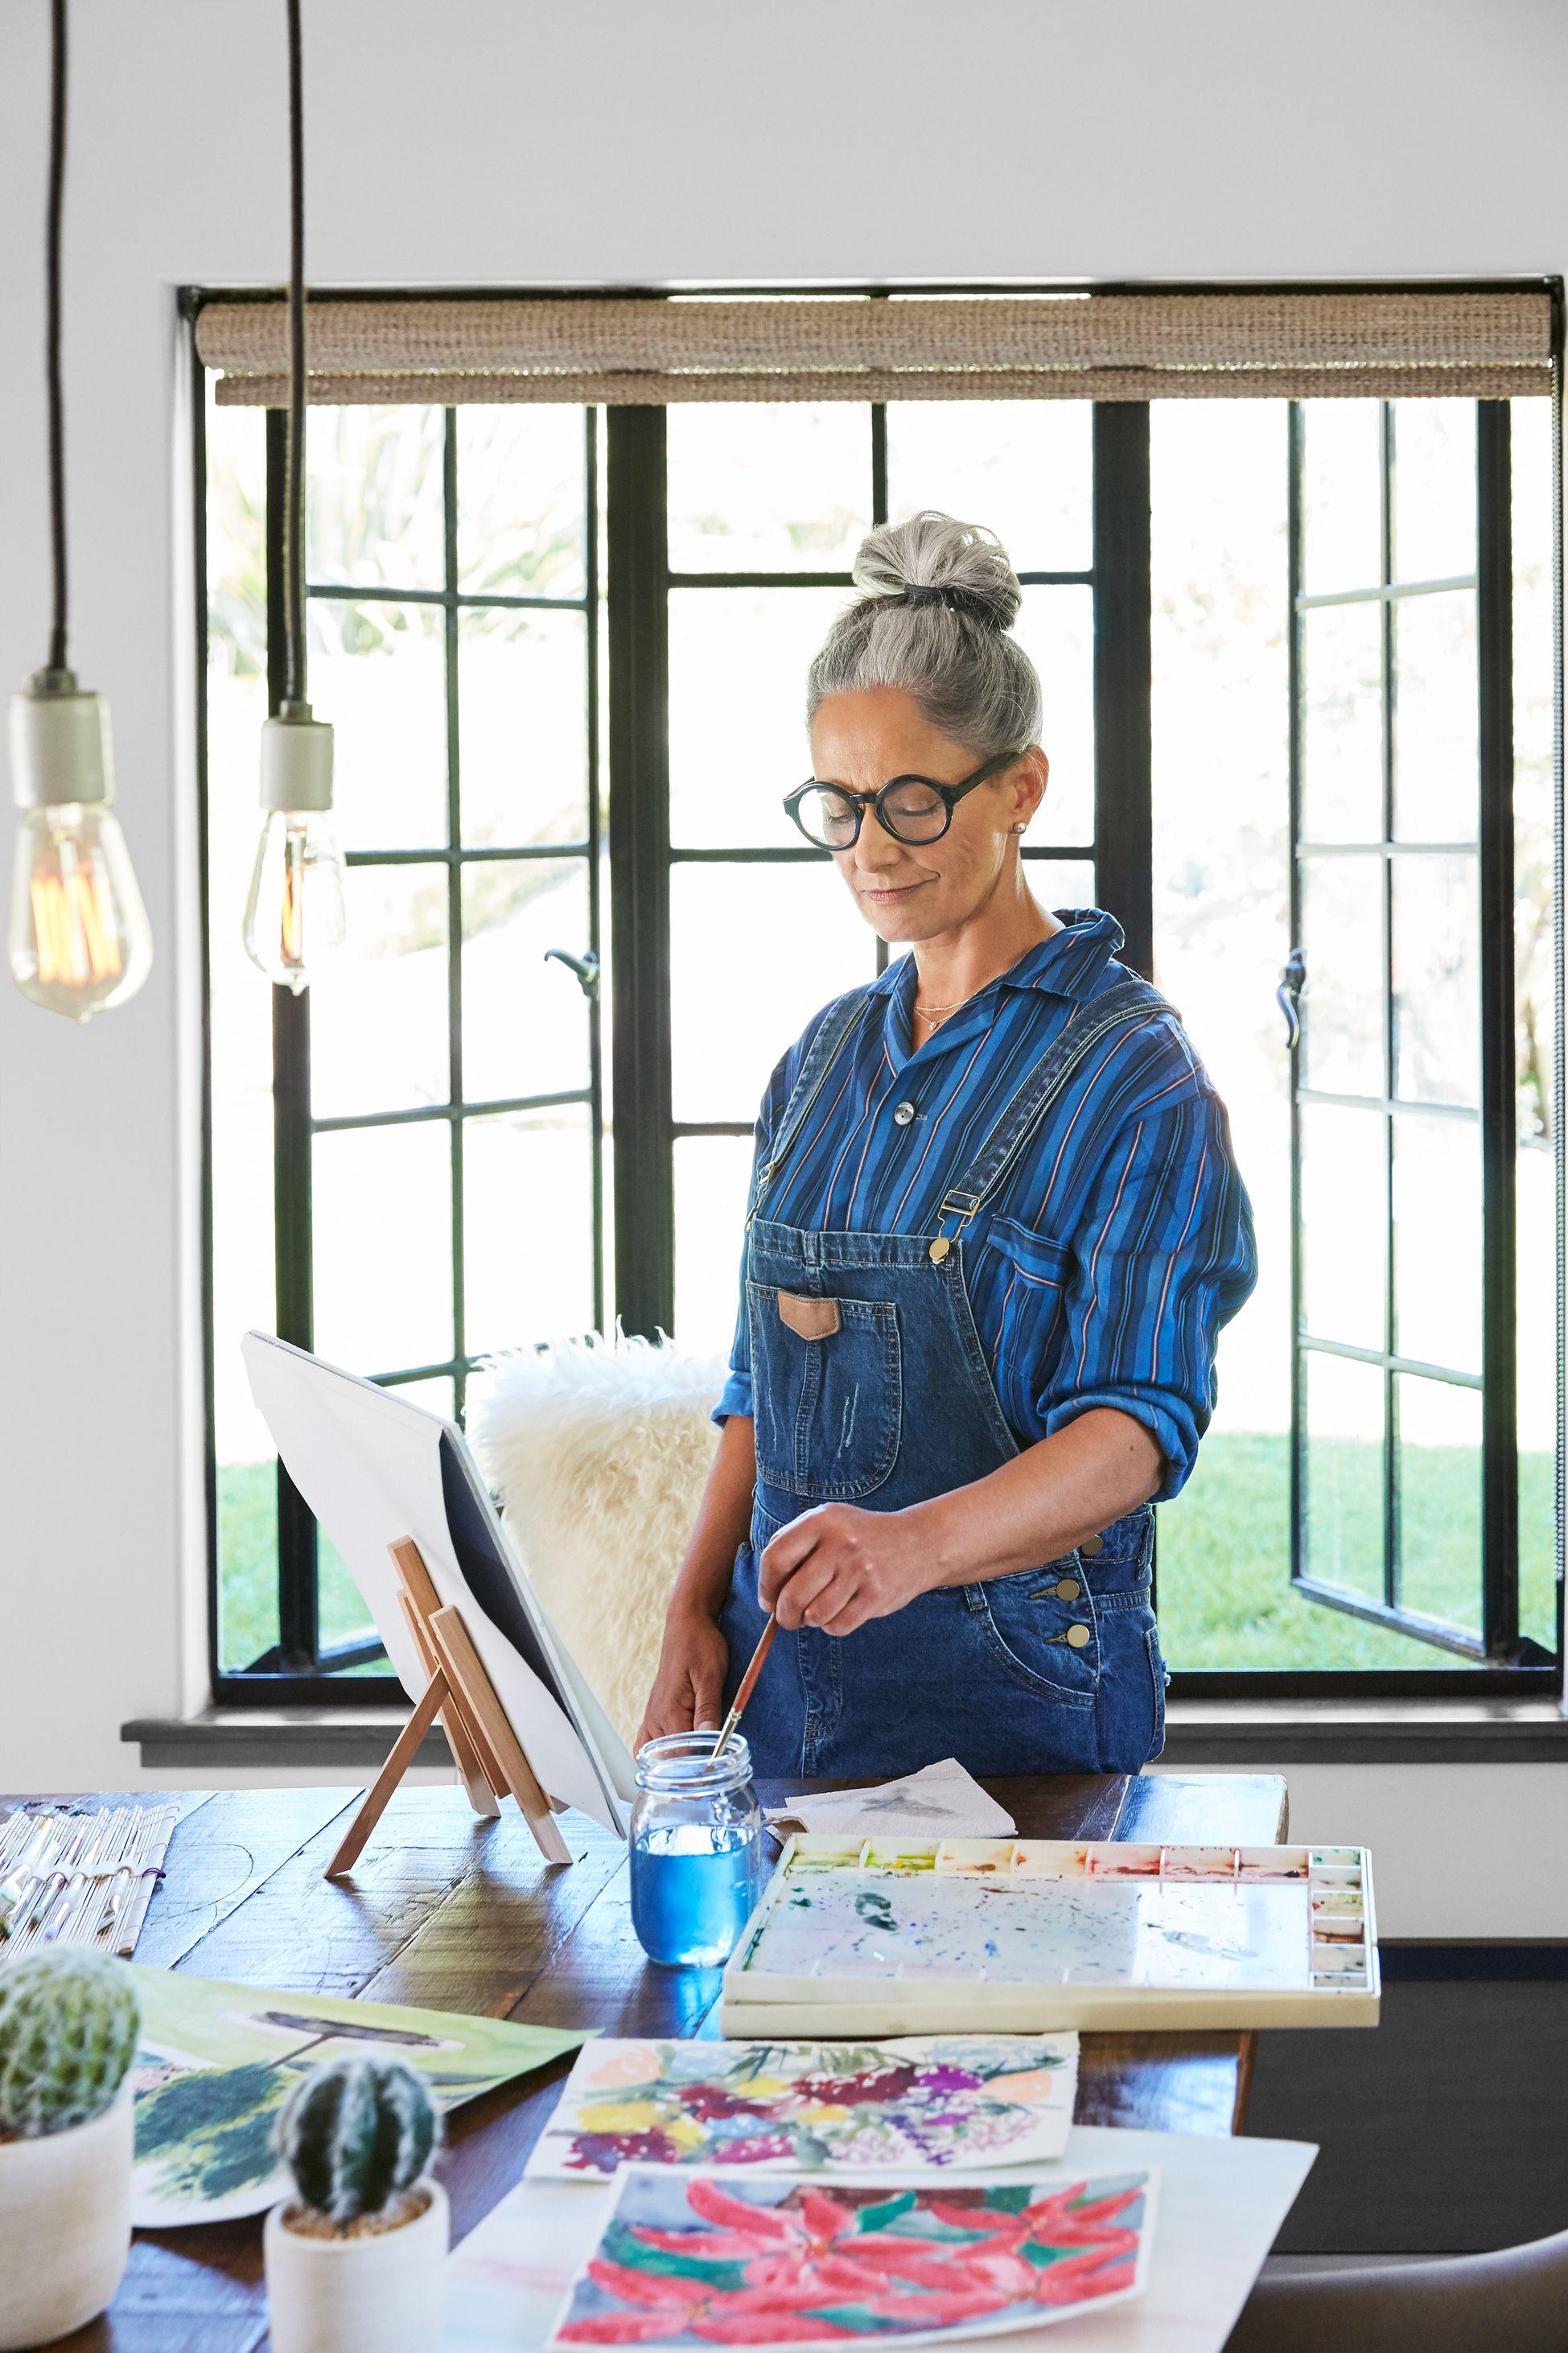 Create Home decor, Furniture, Decor